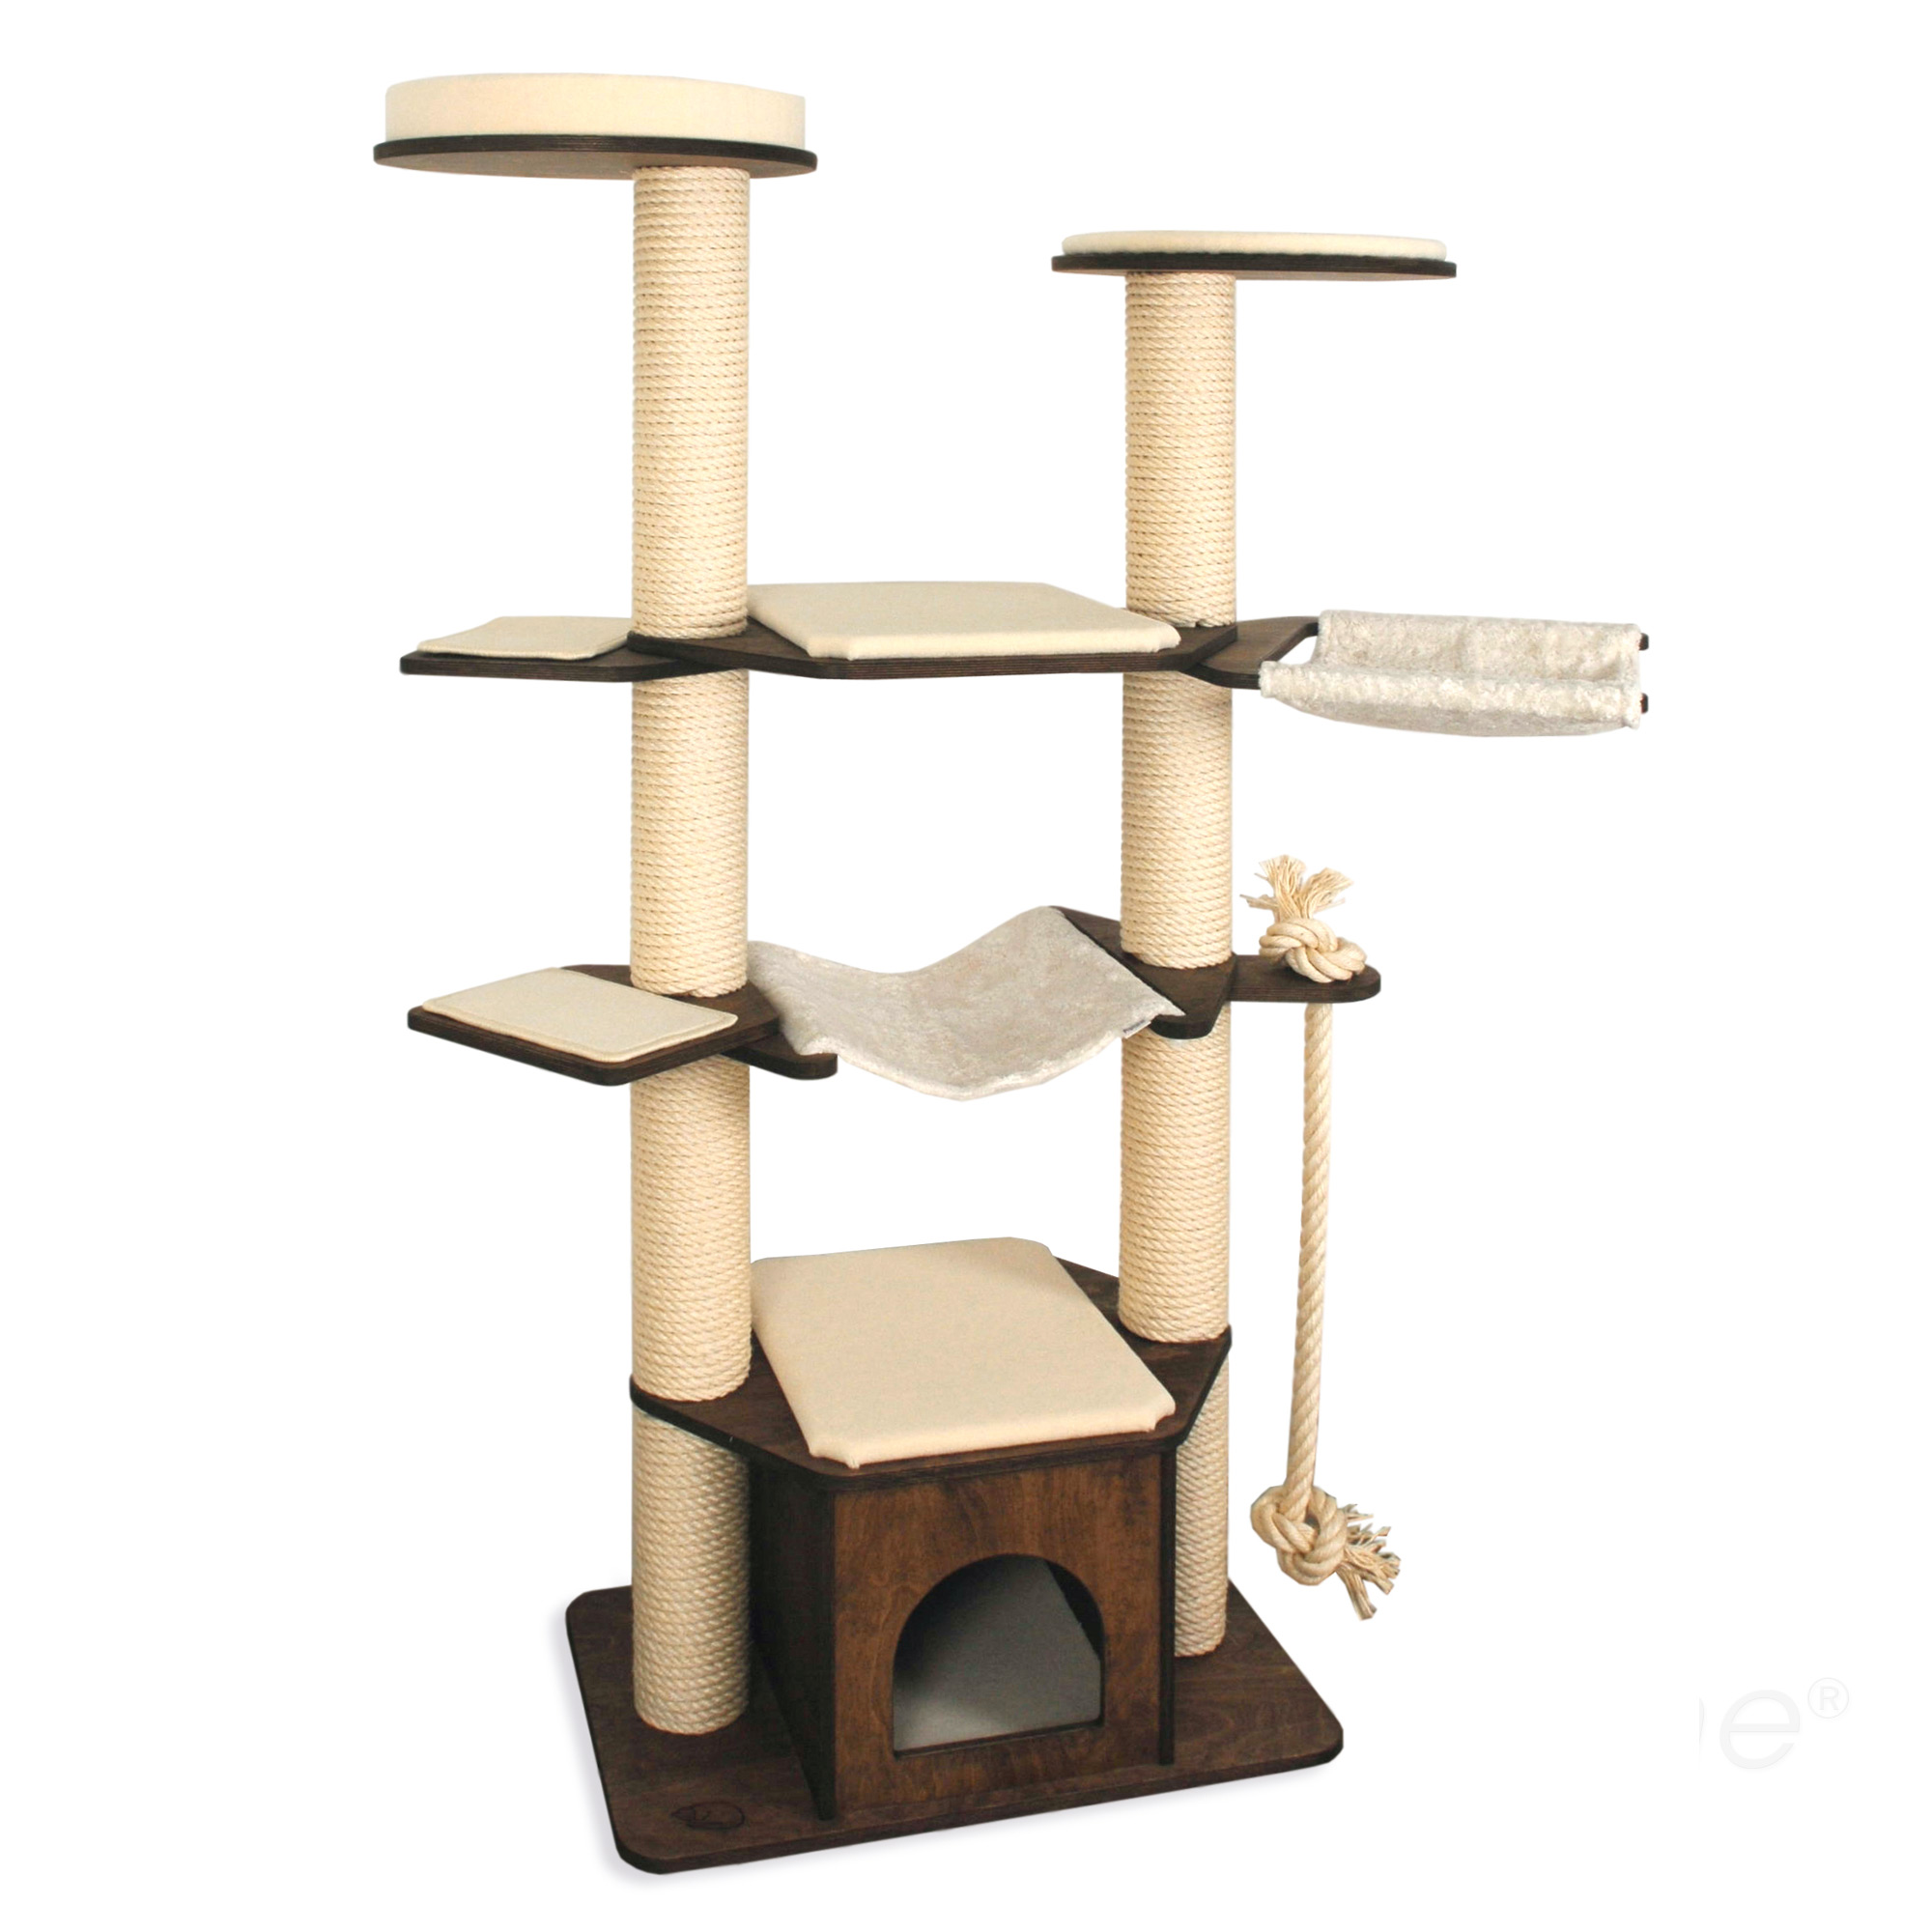 kratzbaum modell vincent 2 stamm kratzbaum kratzb ume. Black Bedroom Furniture Sets. Home Design Ideas